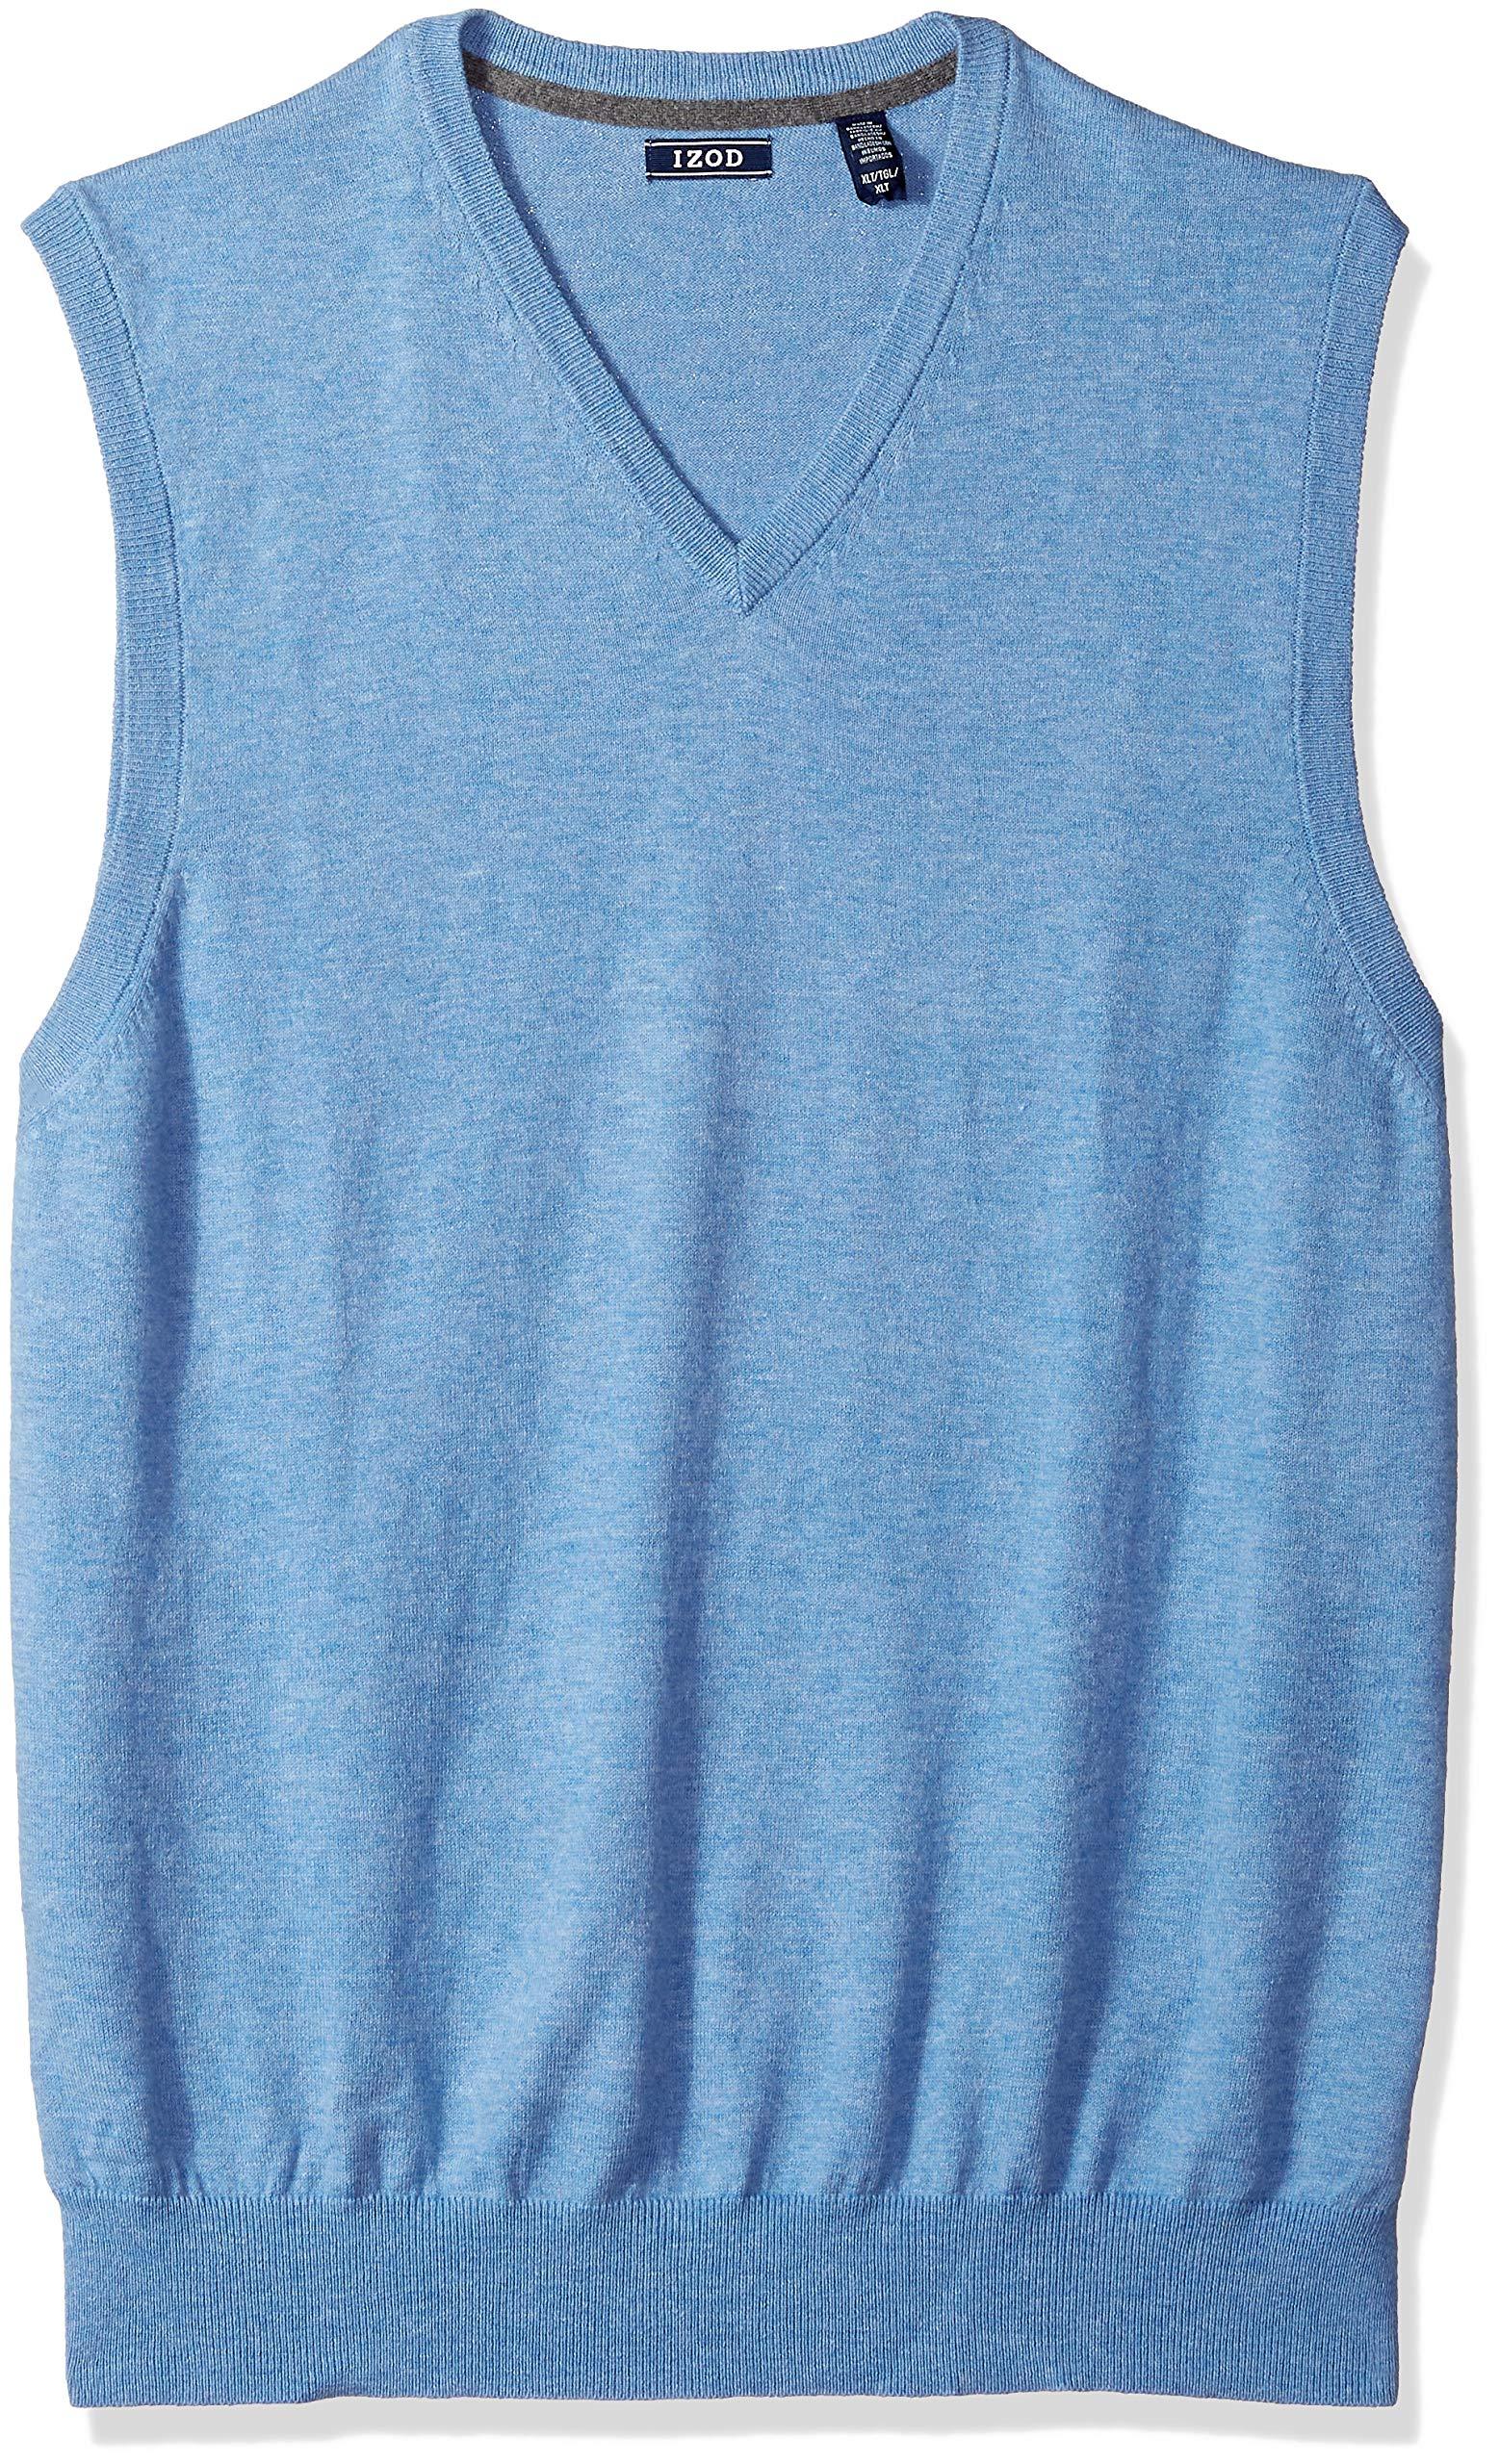 IZOD Men's Big and Tall Premium Essentials Solid V-Neck 12 Gauge Sweater Vest, New Revival, X-Large by IZOD